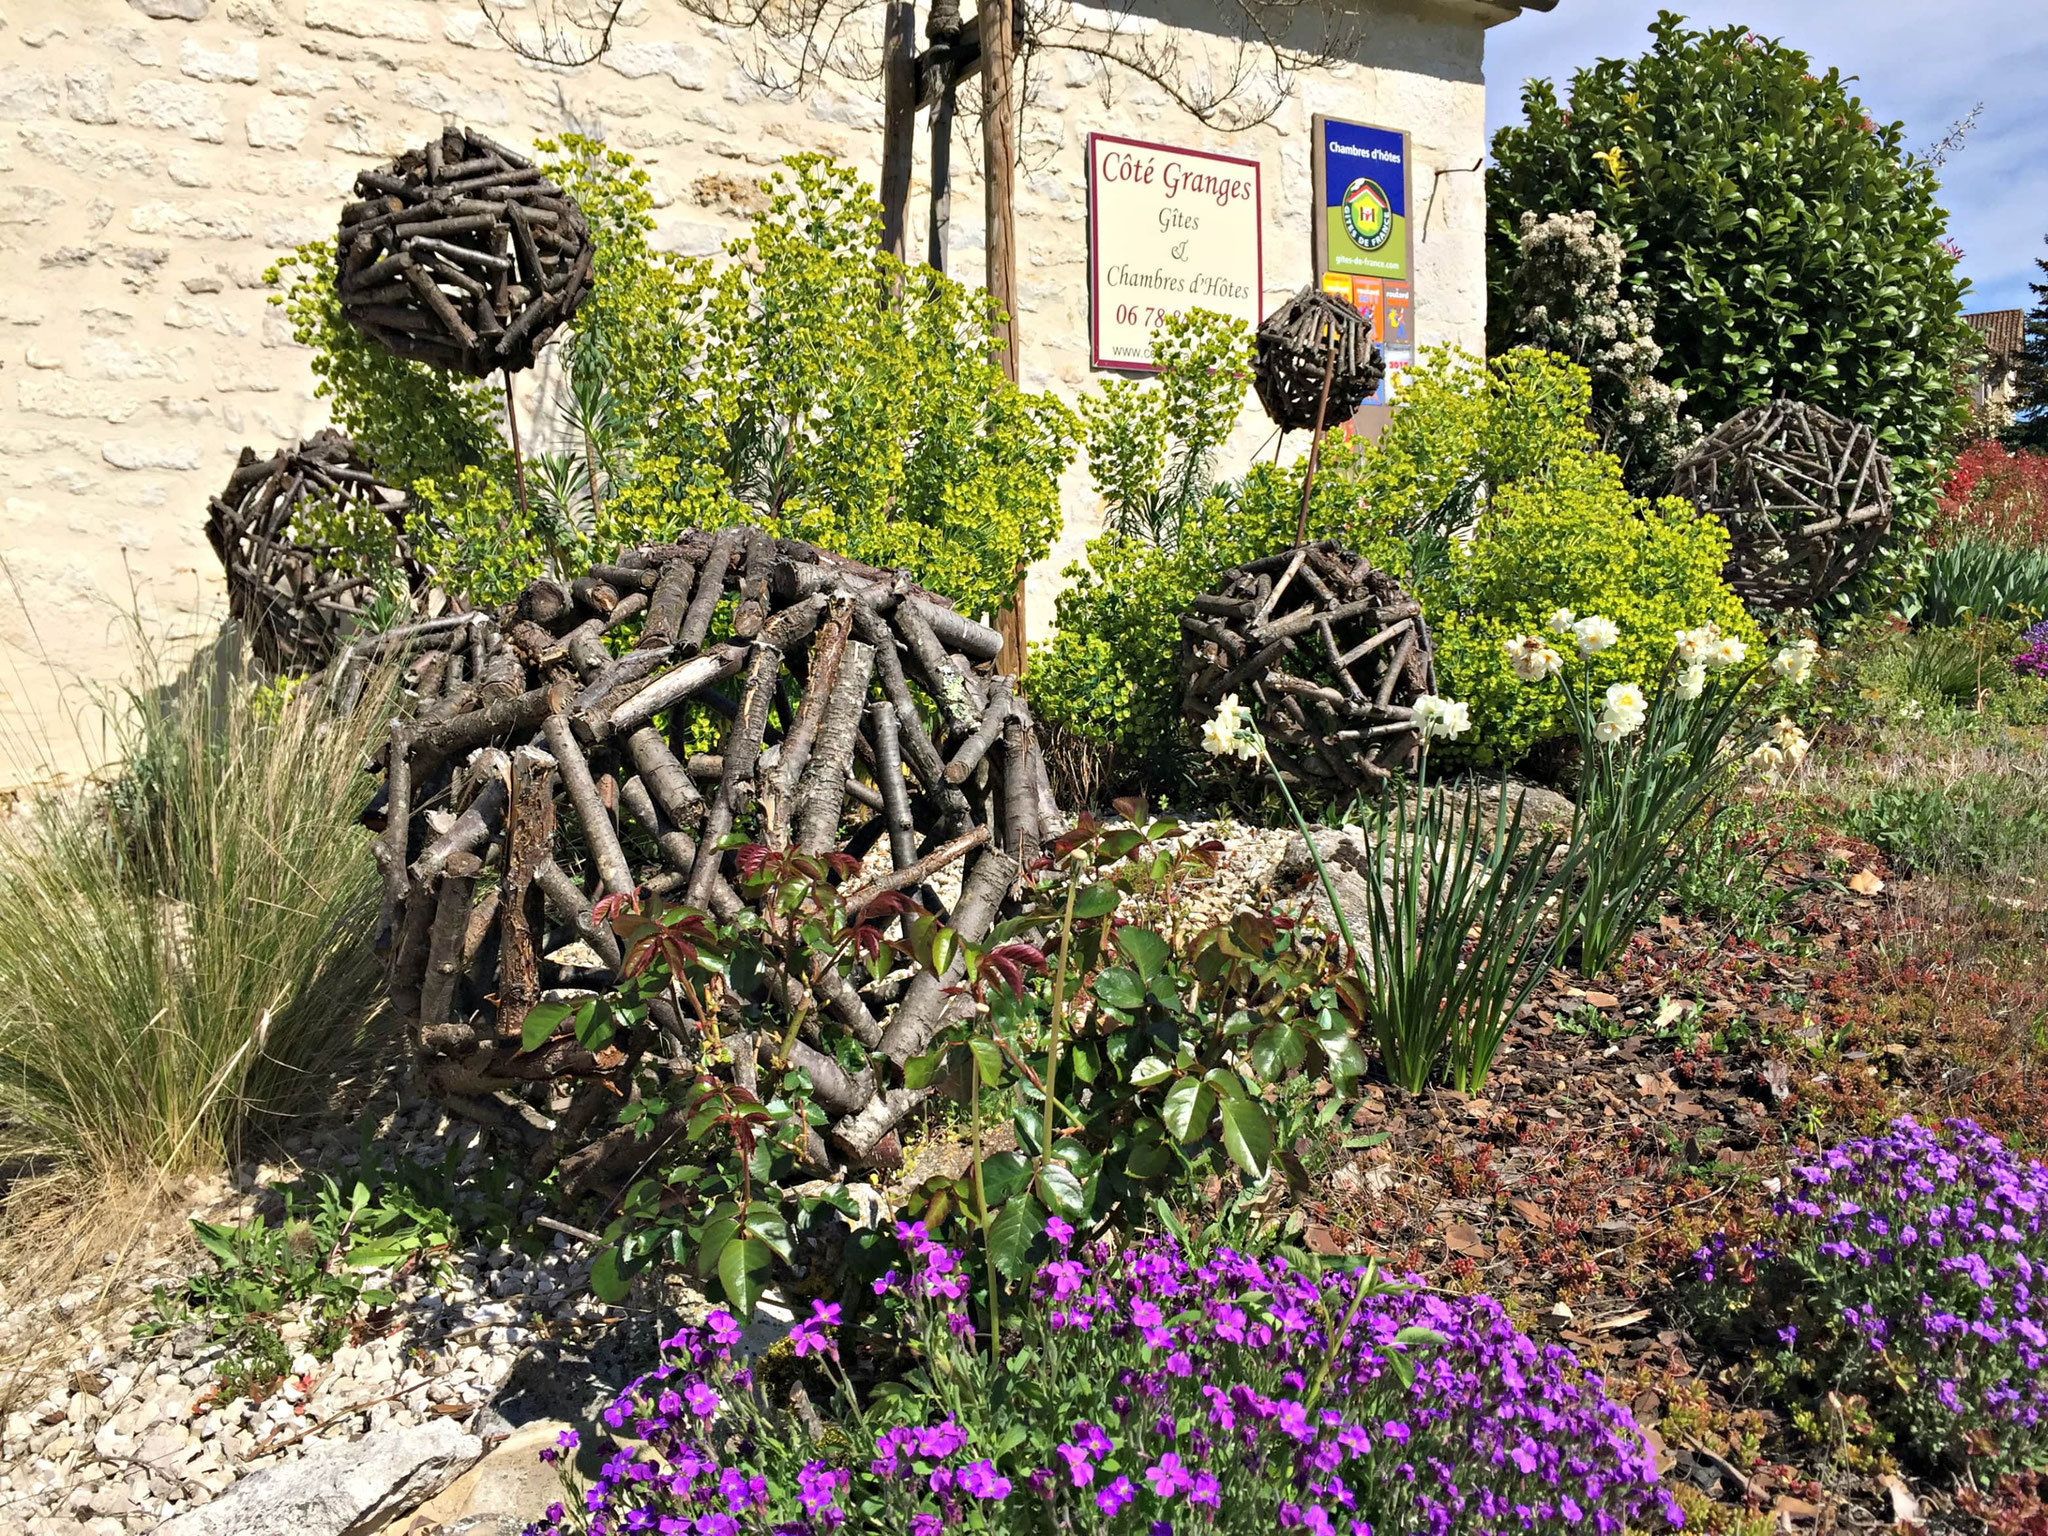 Un autre petit jardin paysagé